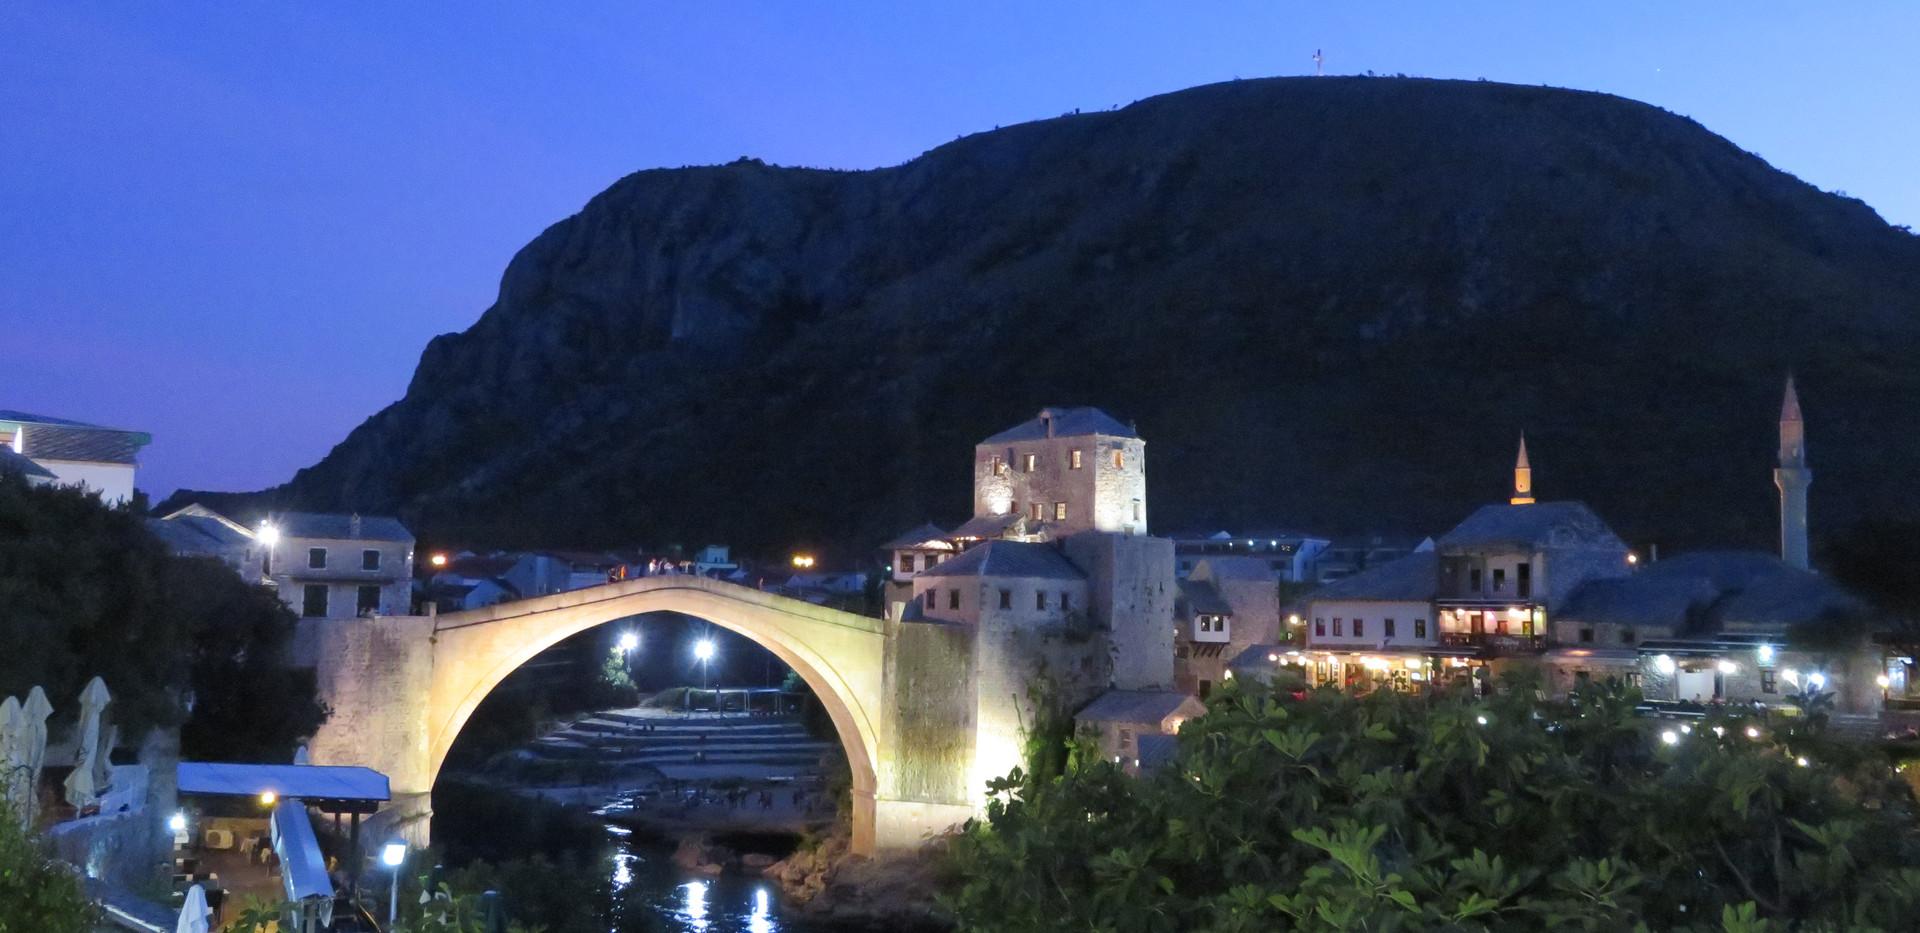 2018 Mostar, Bosnia-Herzegovina famed br